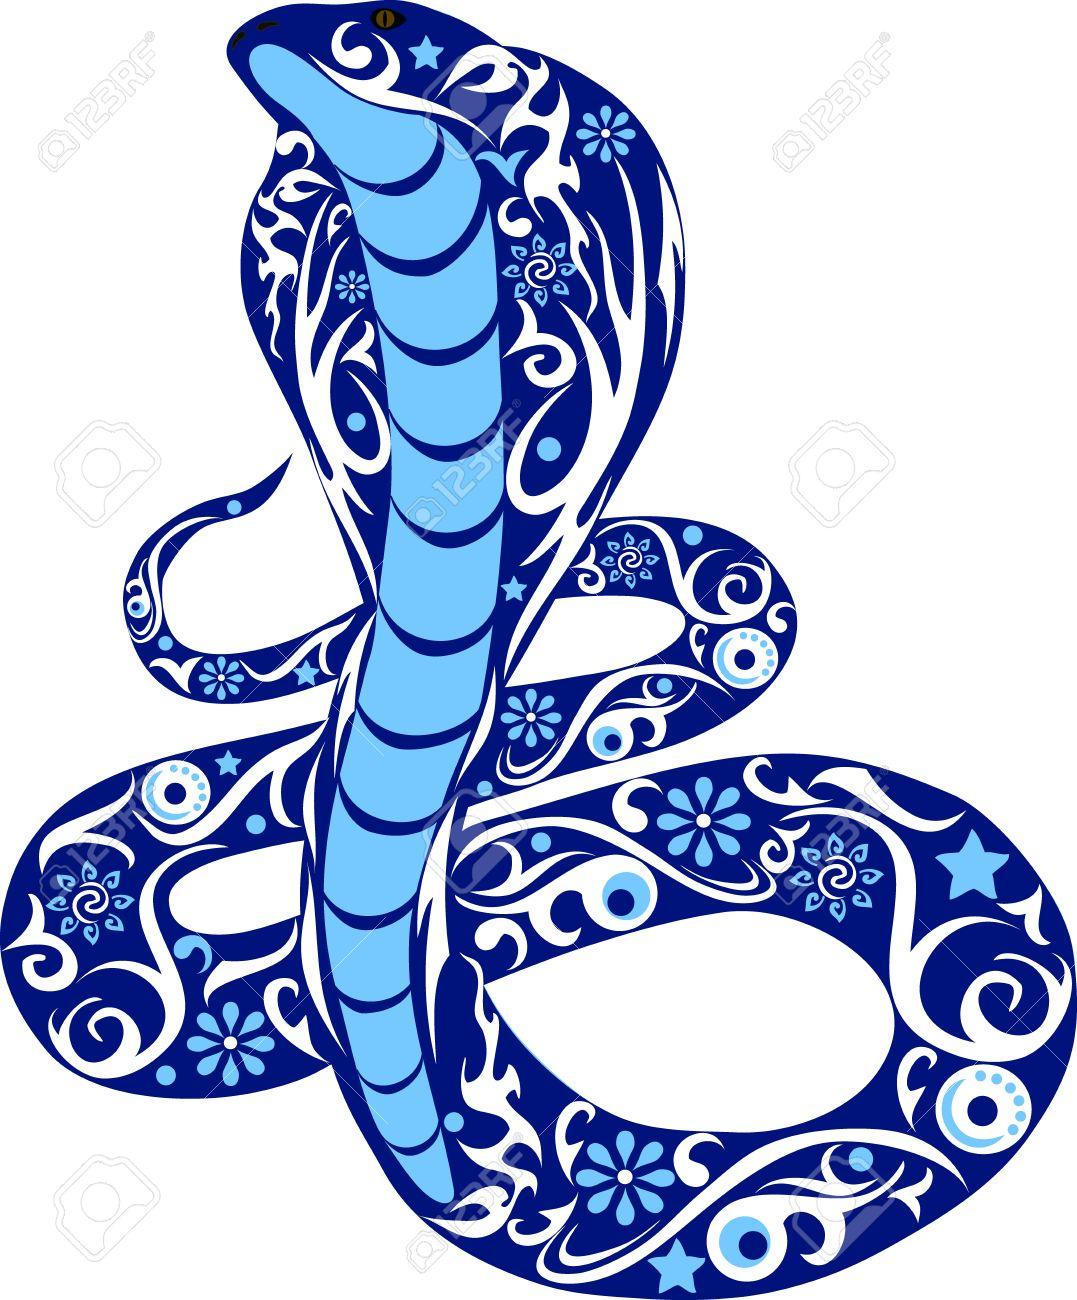 Dessin Cobra serpent avec le dessin, un cobra l'animal sauvage courbettes avec un